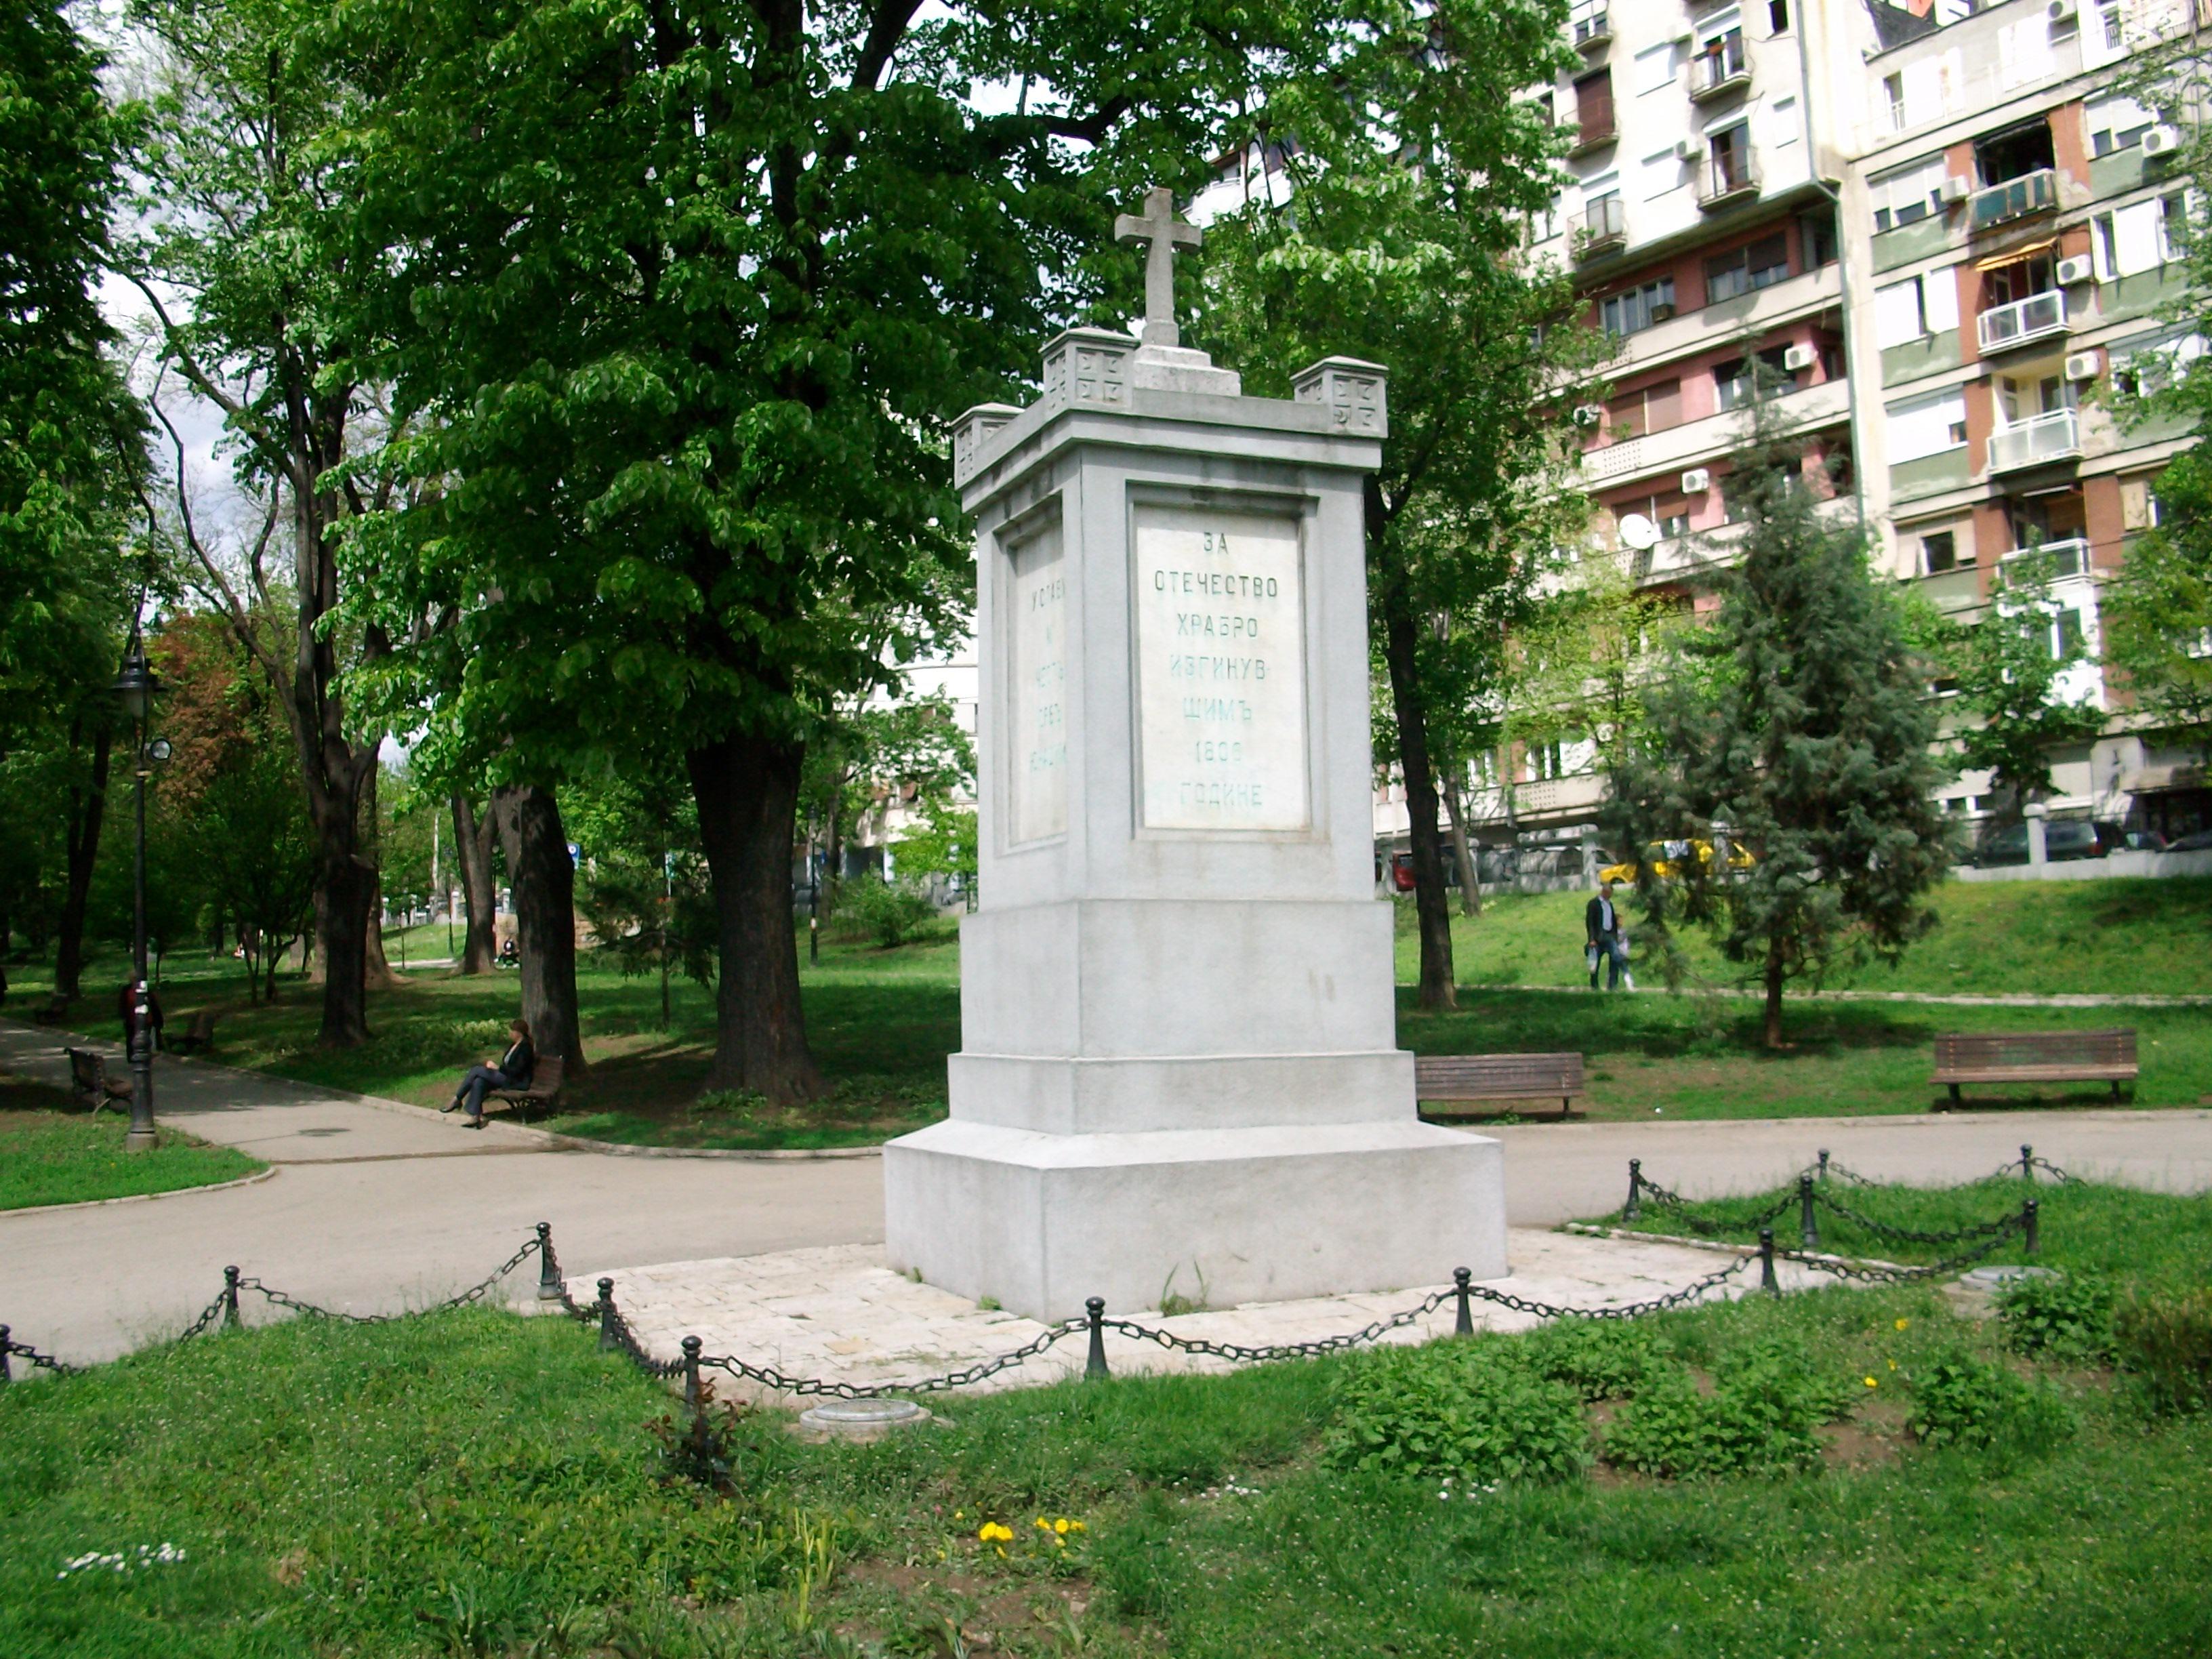 Spomenik I Grobљe Oslobodilaca Beograda 1806 Godine Vikipediјa